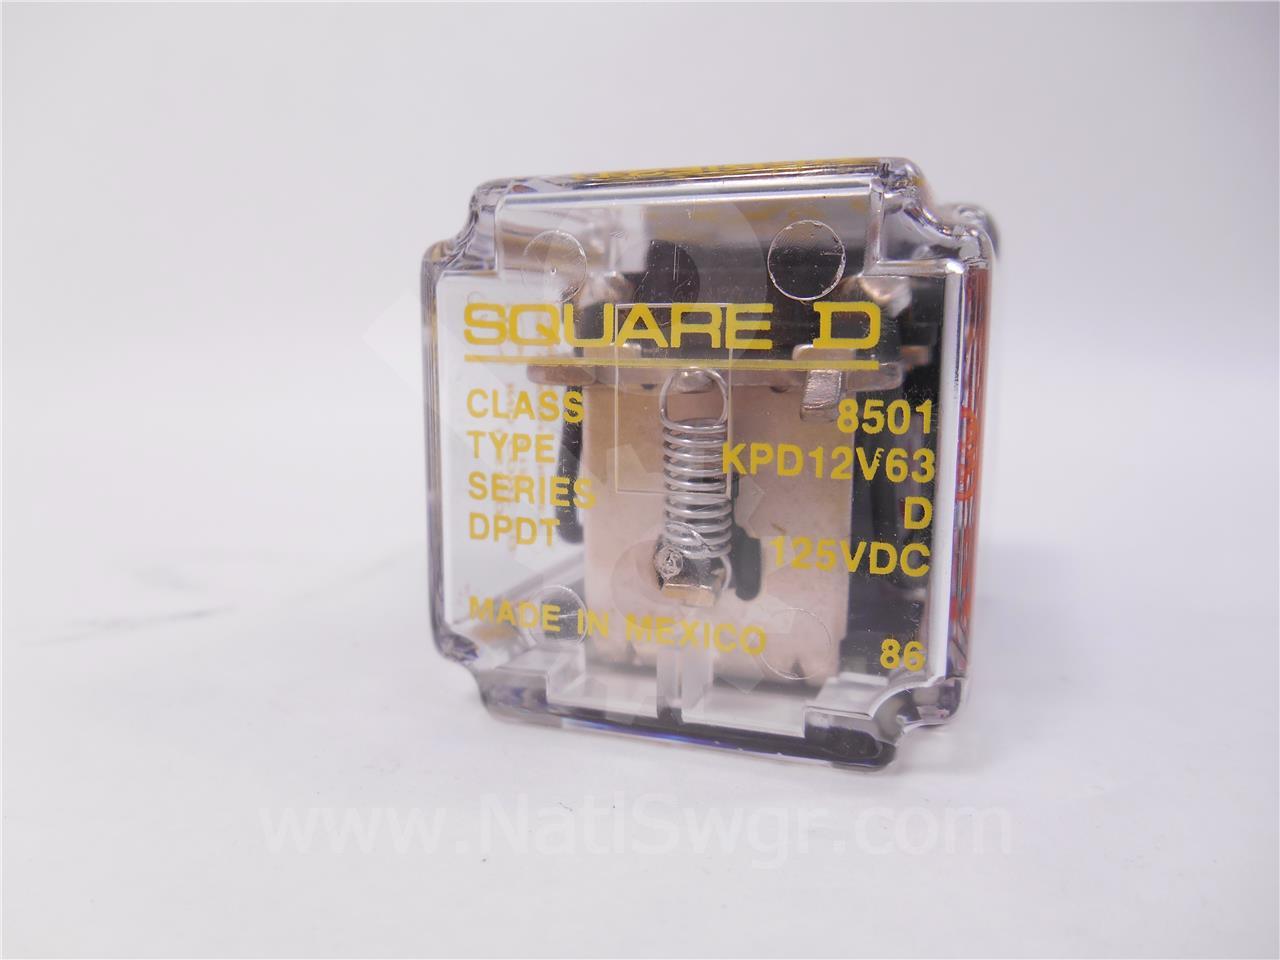 Square D SQD 125VDC CONTROL RELAY Y